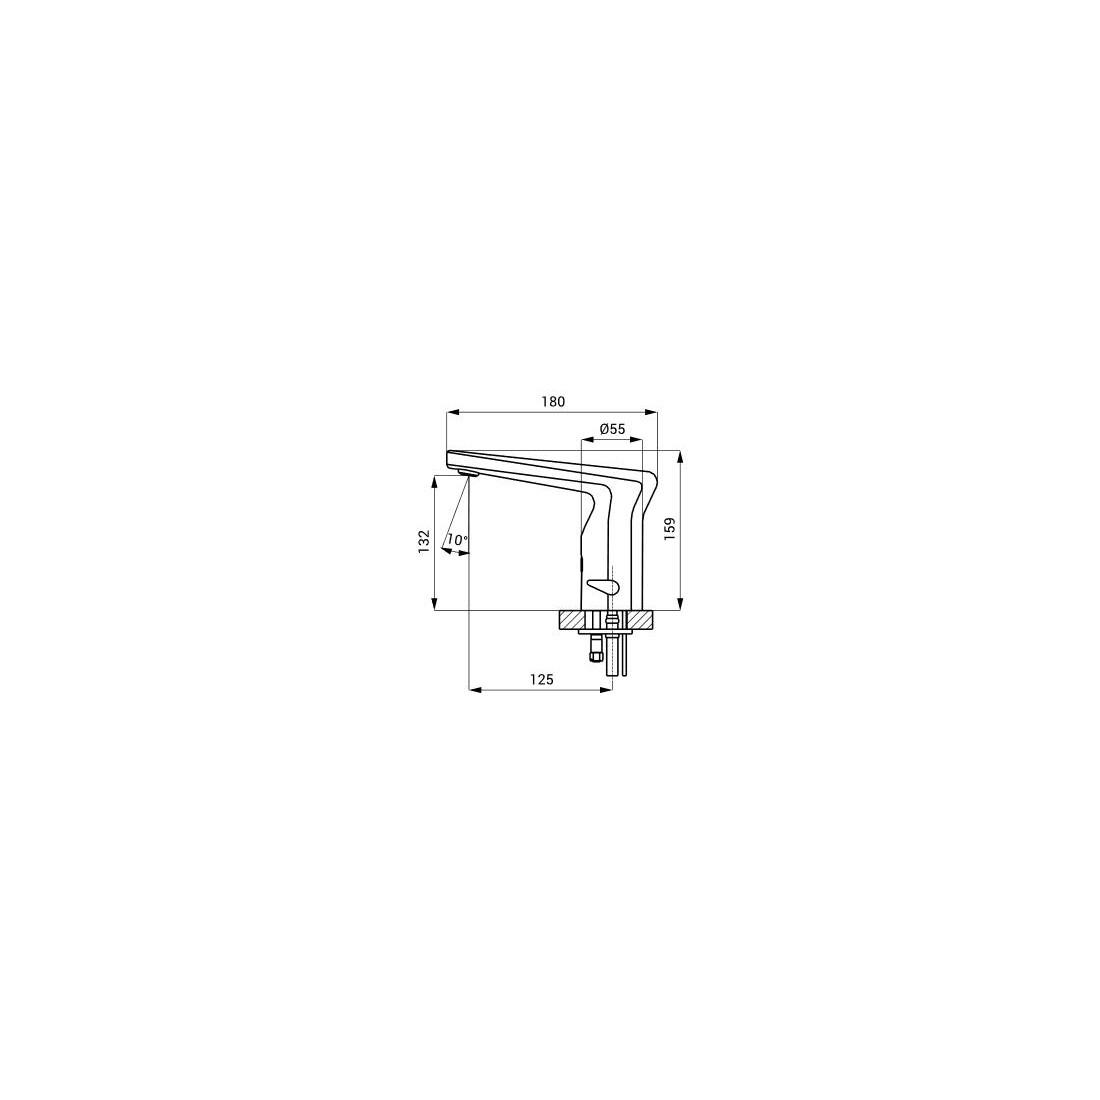 Praustuvo maišytuvas Sanela SLU 37 su integruota elektronika, 24 V DC